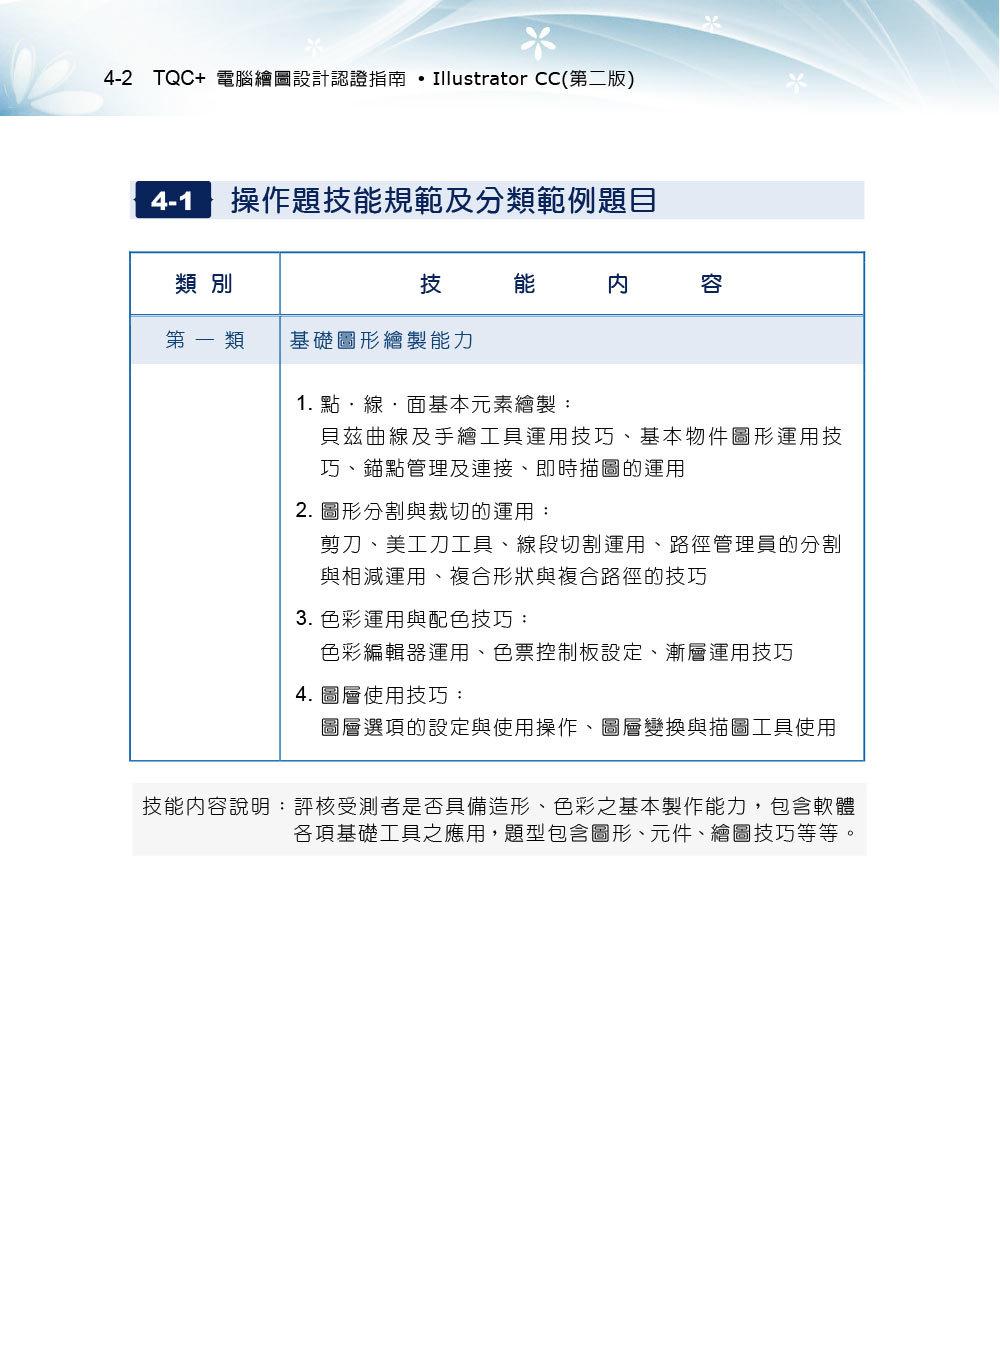 TQC+ 電腦繪圖設計認證指南 Illustrator CC, 2/e-preview-1